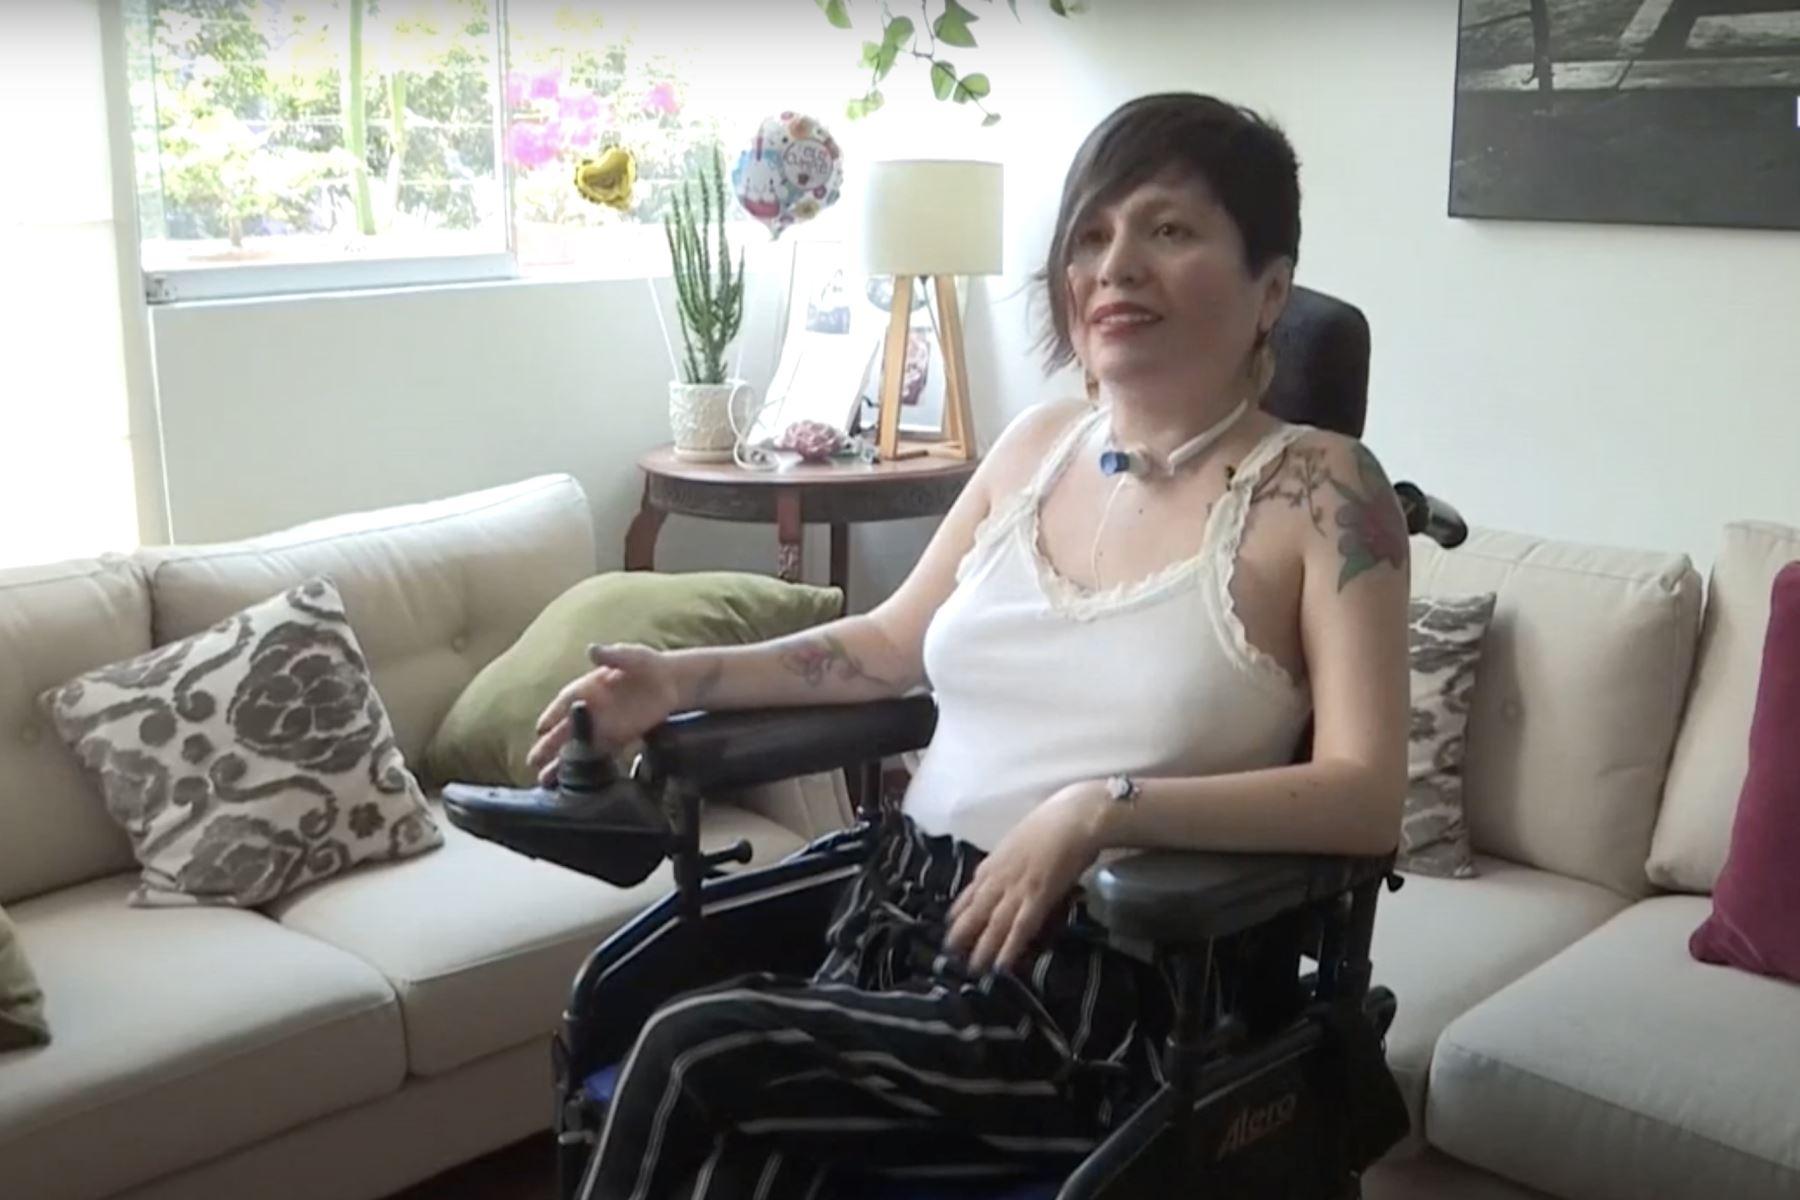 Juzgado ordena respetar decisión de Ana Estrada de someterse a eutanasia